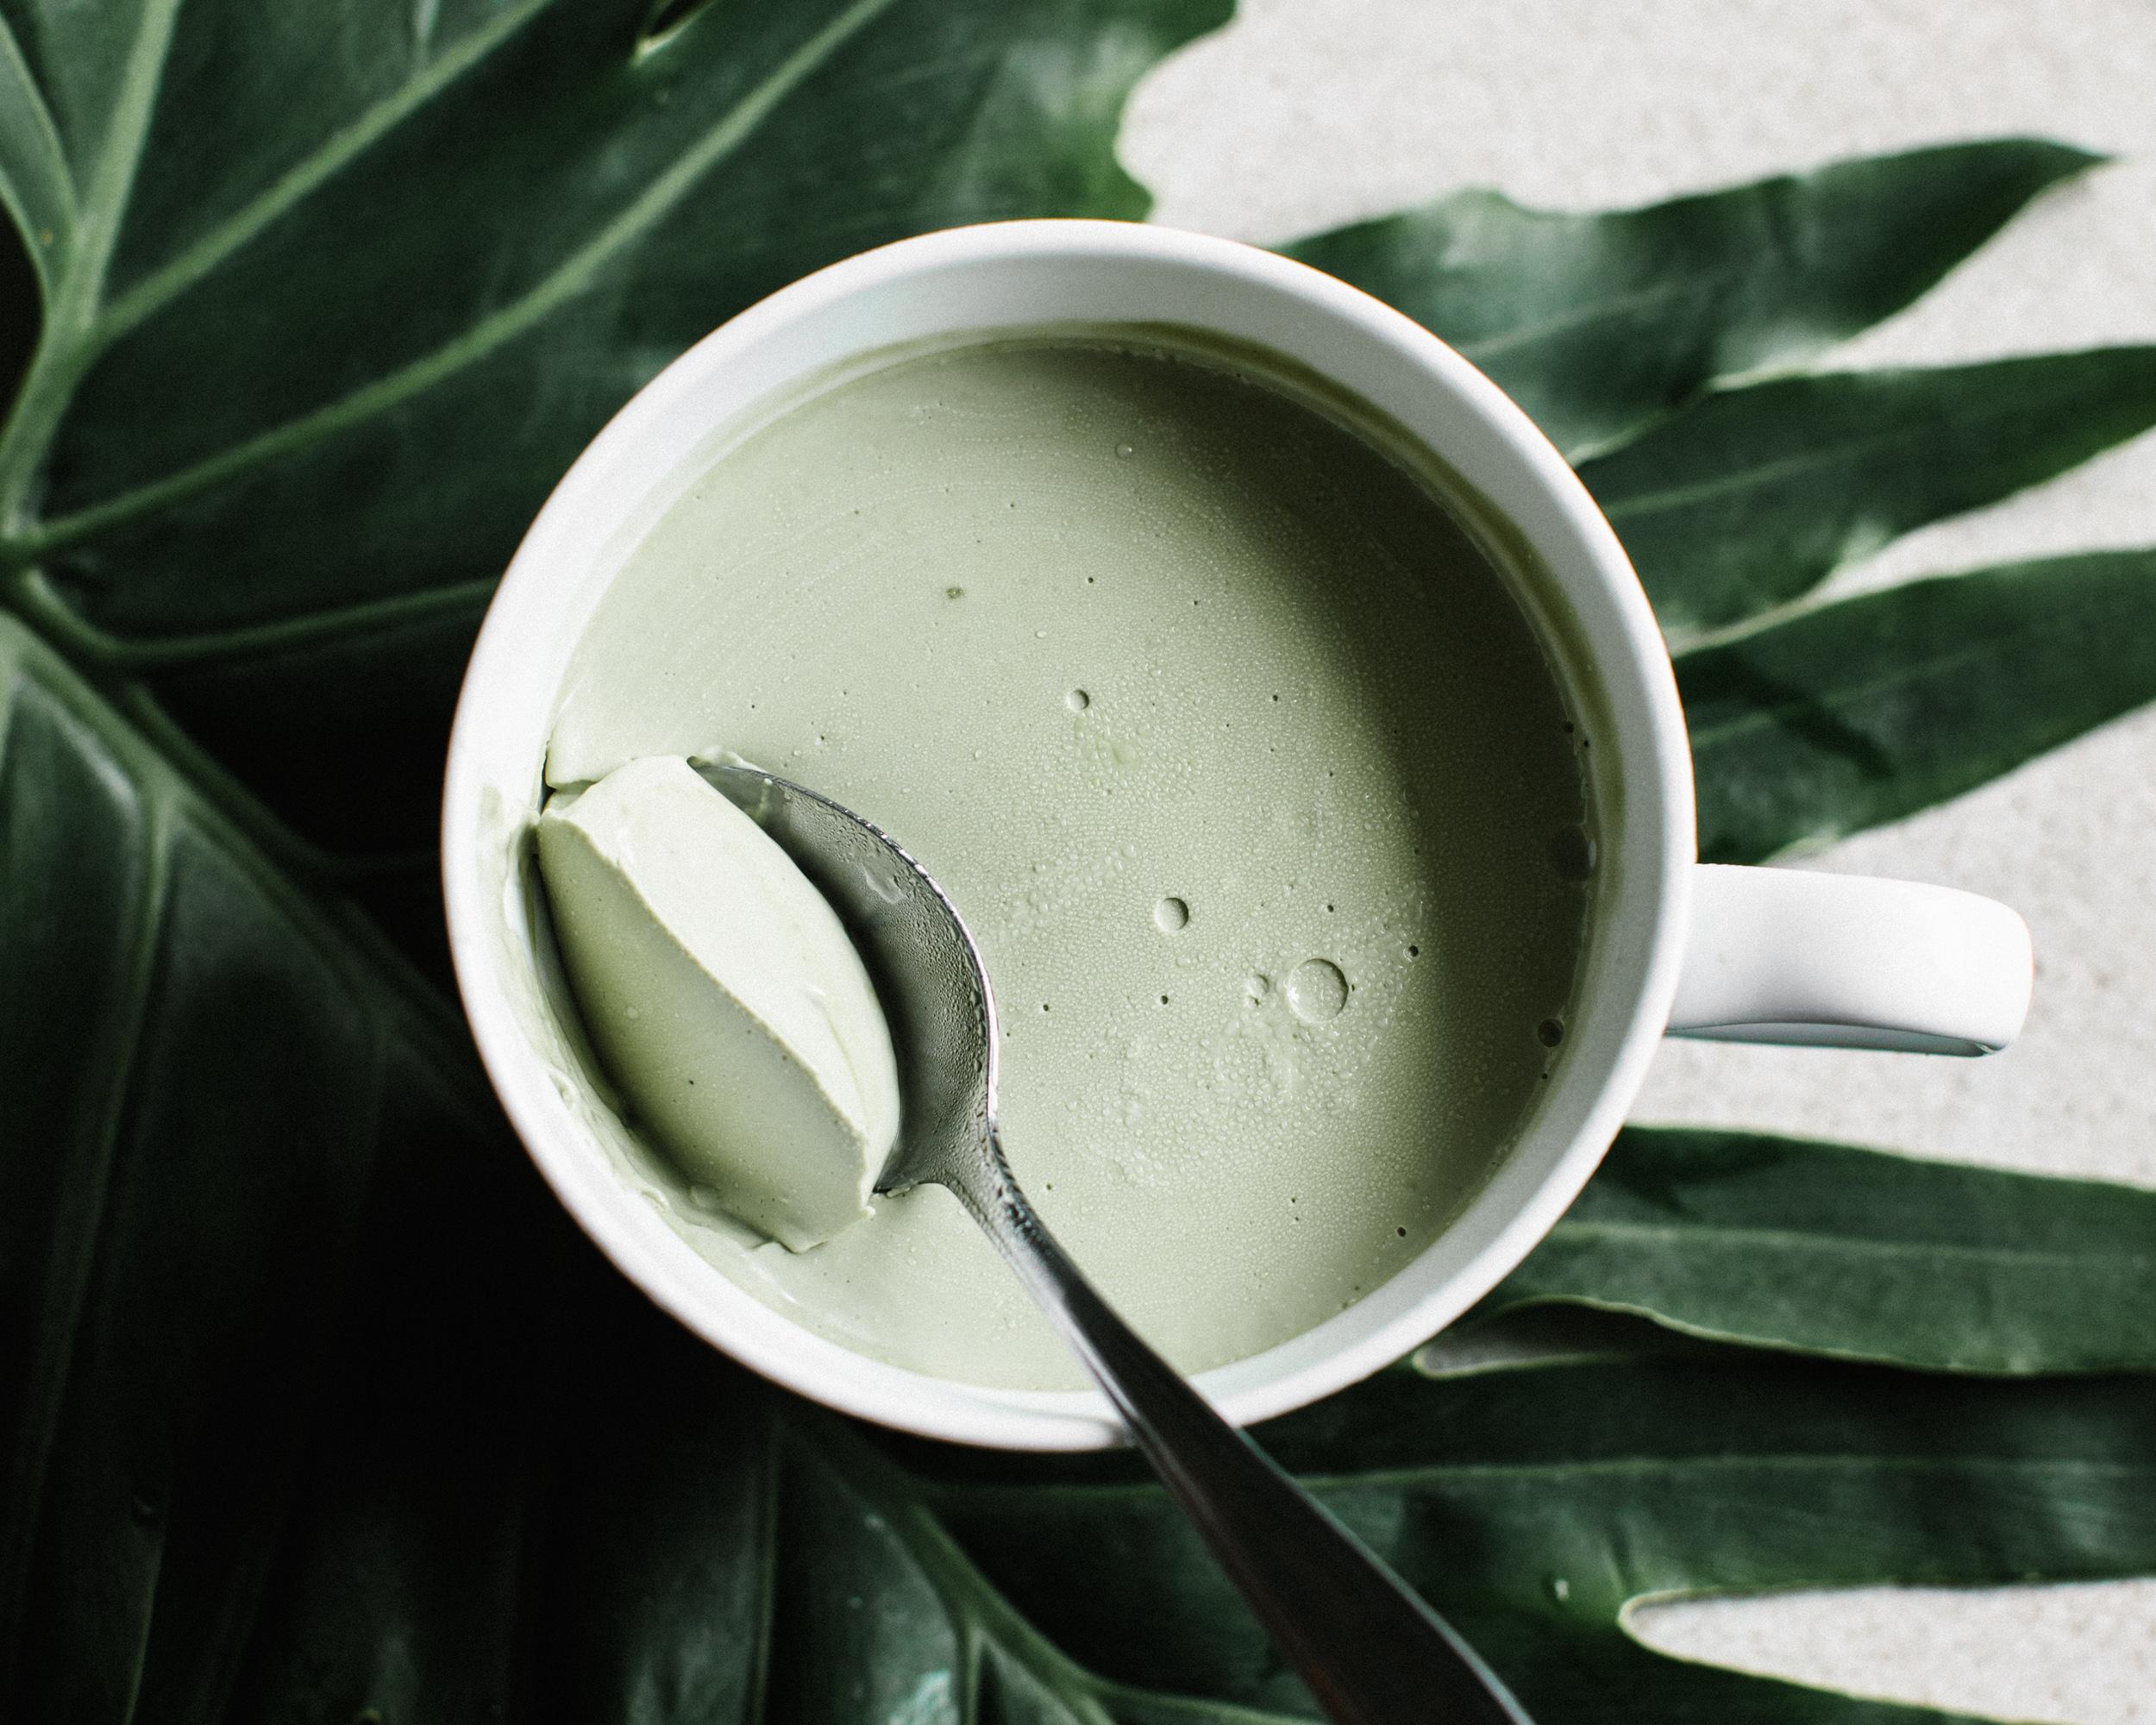 Creamy_Coconut_and_Matcha_Panna_Cotta_by_Jordan_Pie_Nutritionist-1.jpg